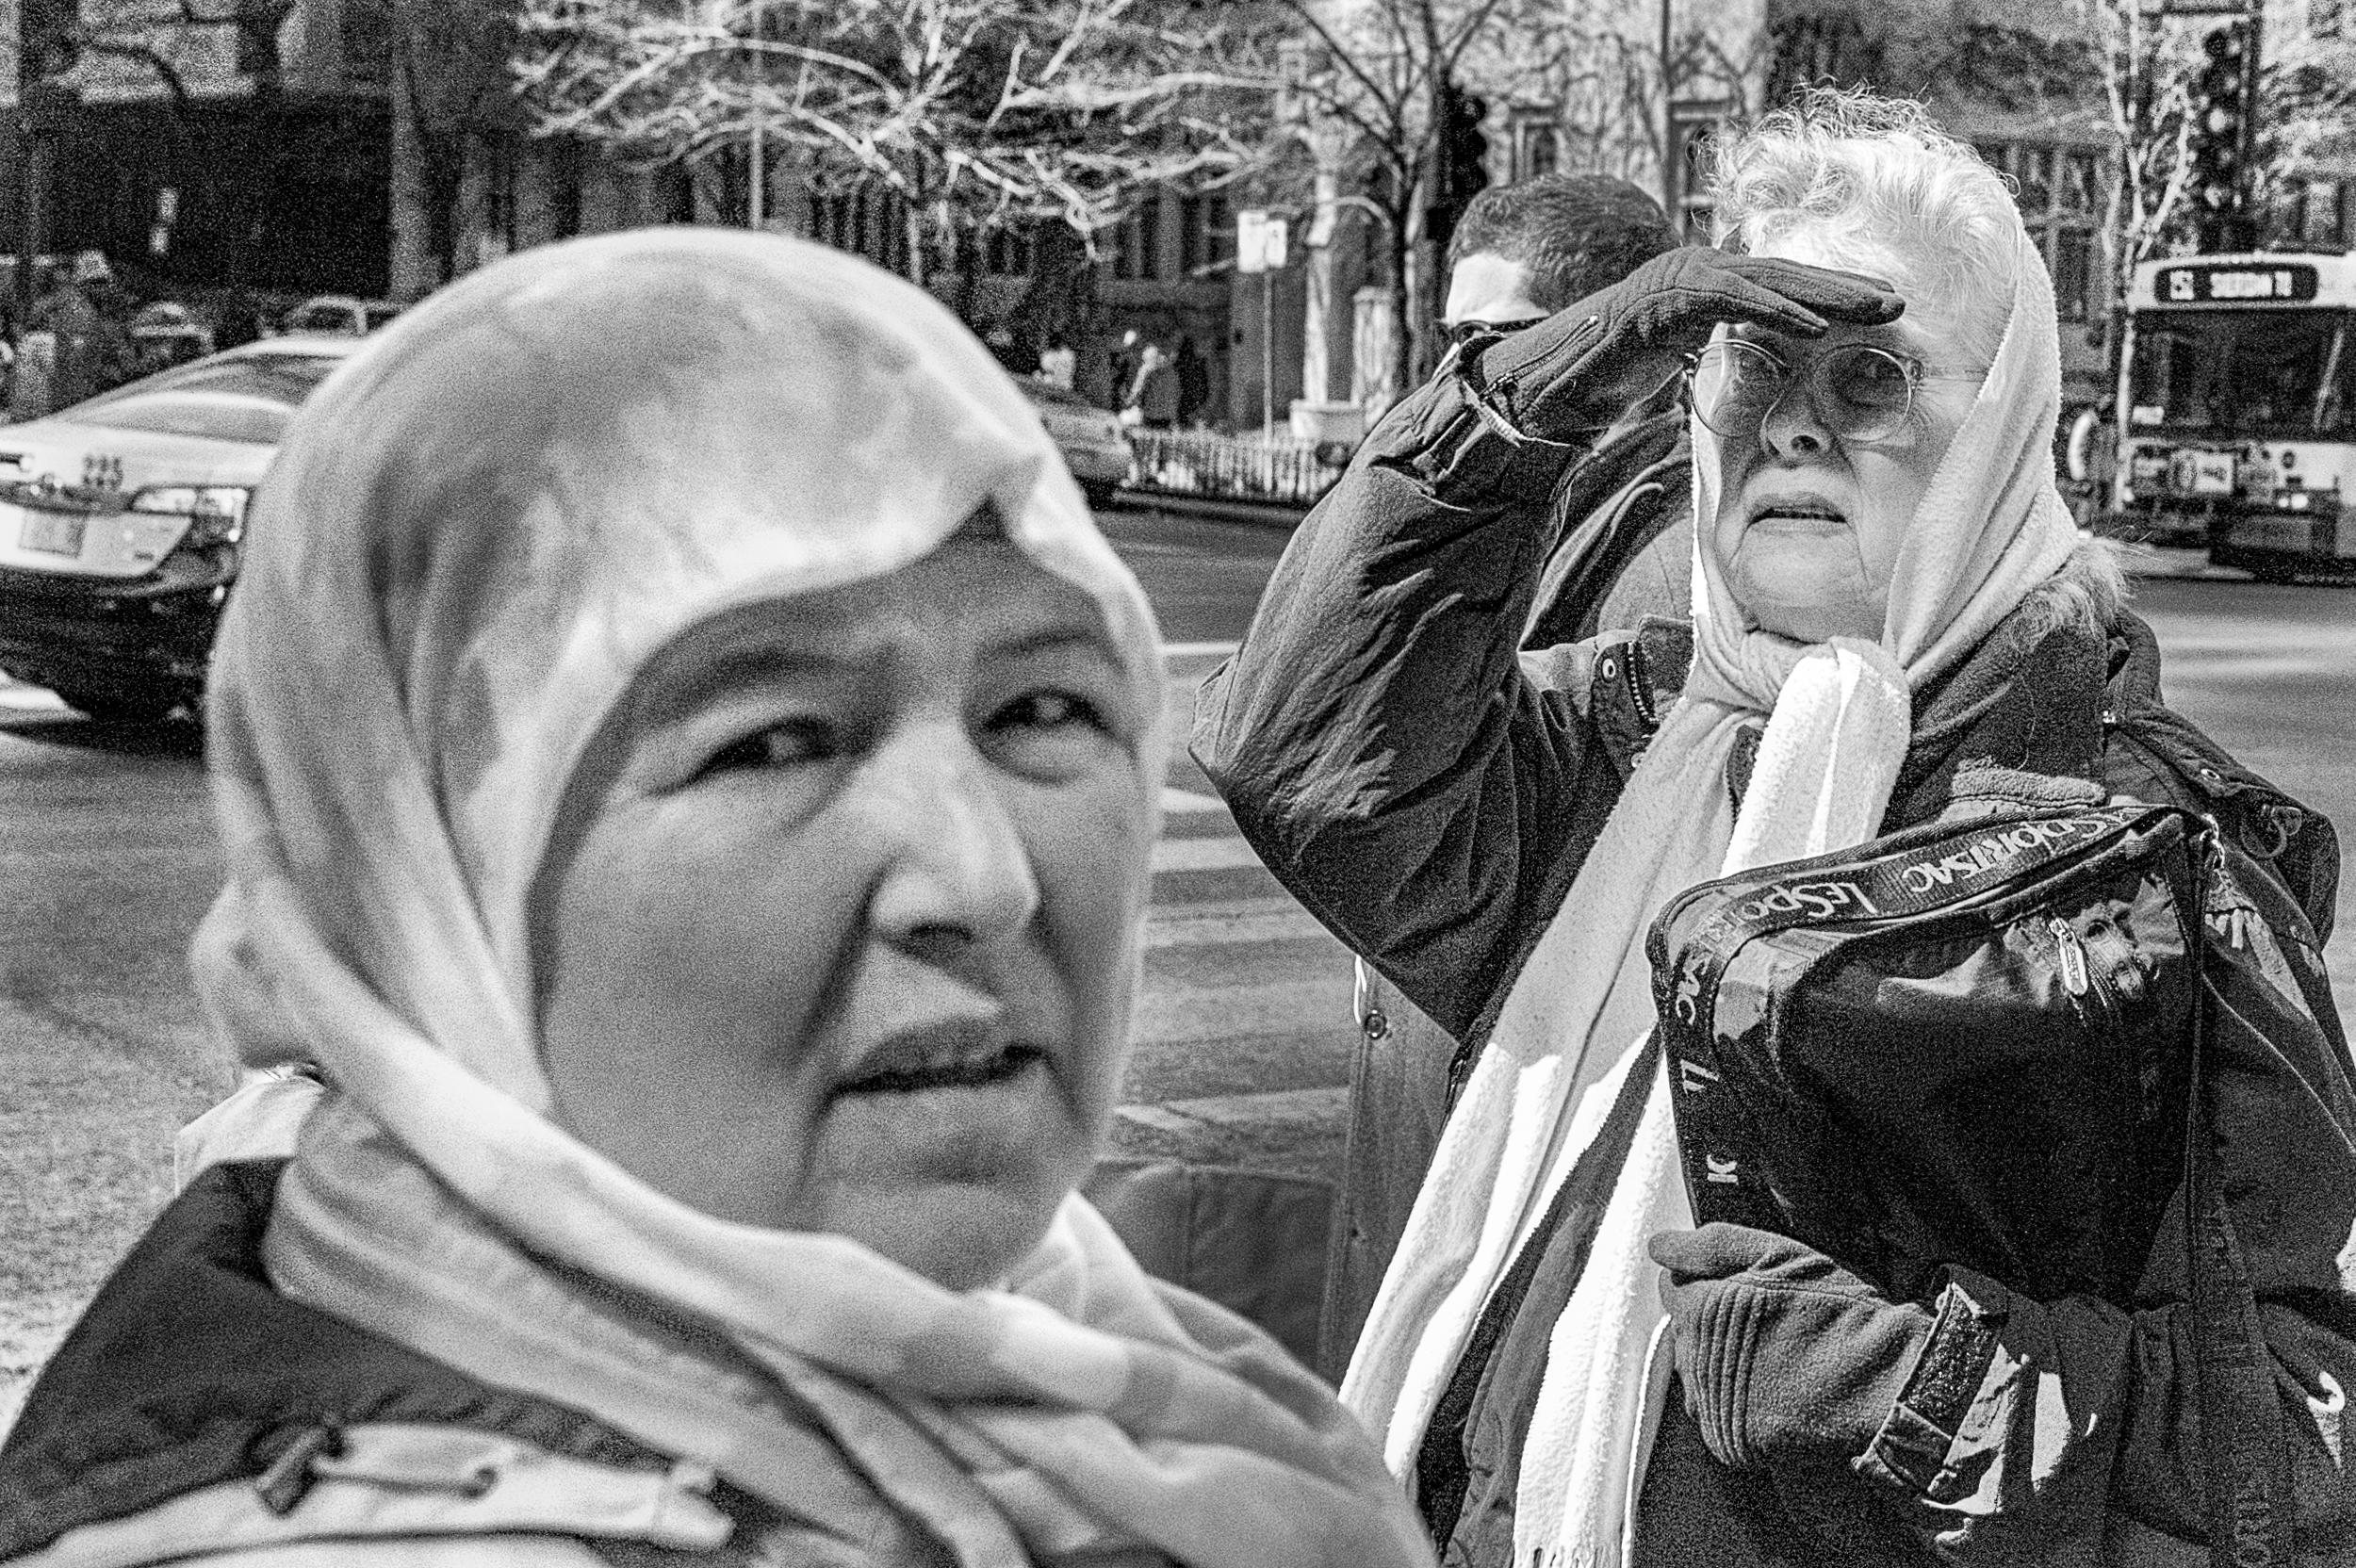 portraits_street-2.jpg